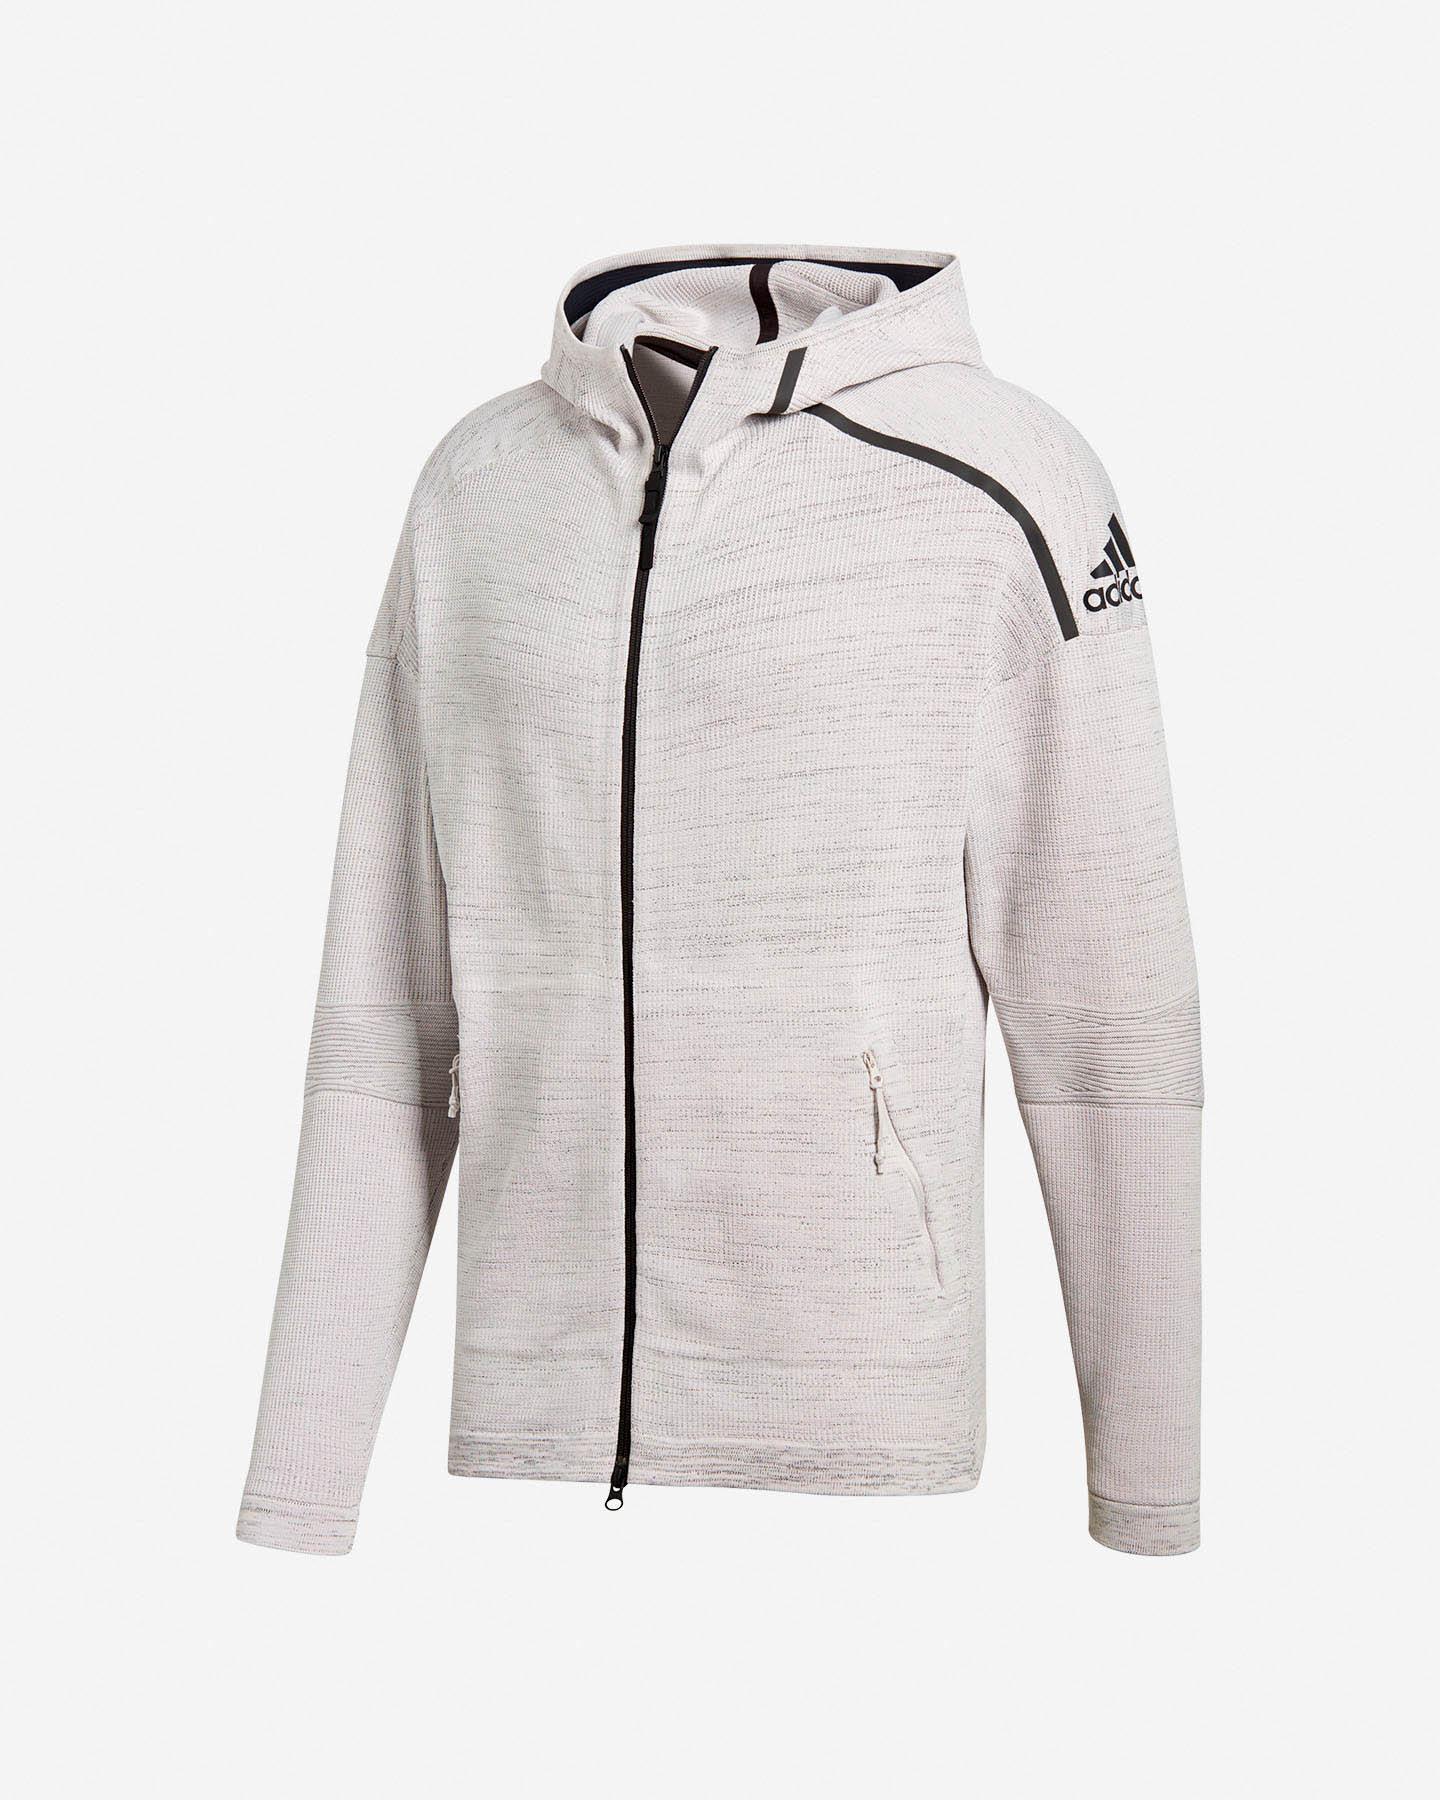 Hood Primeknit Zne Adidas Cf0636cisalfa M Sport 4rlq35ja Felpa m8wNn0